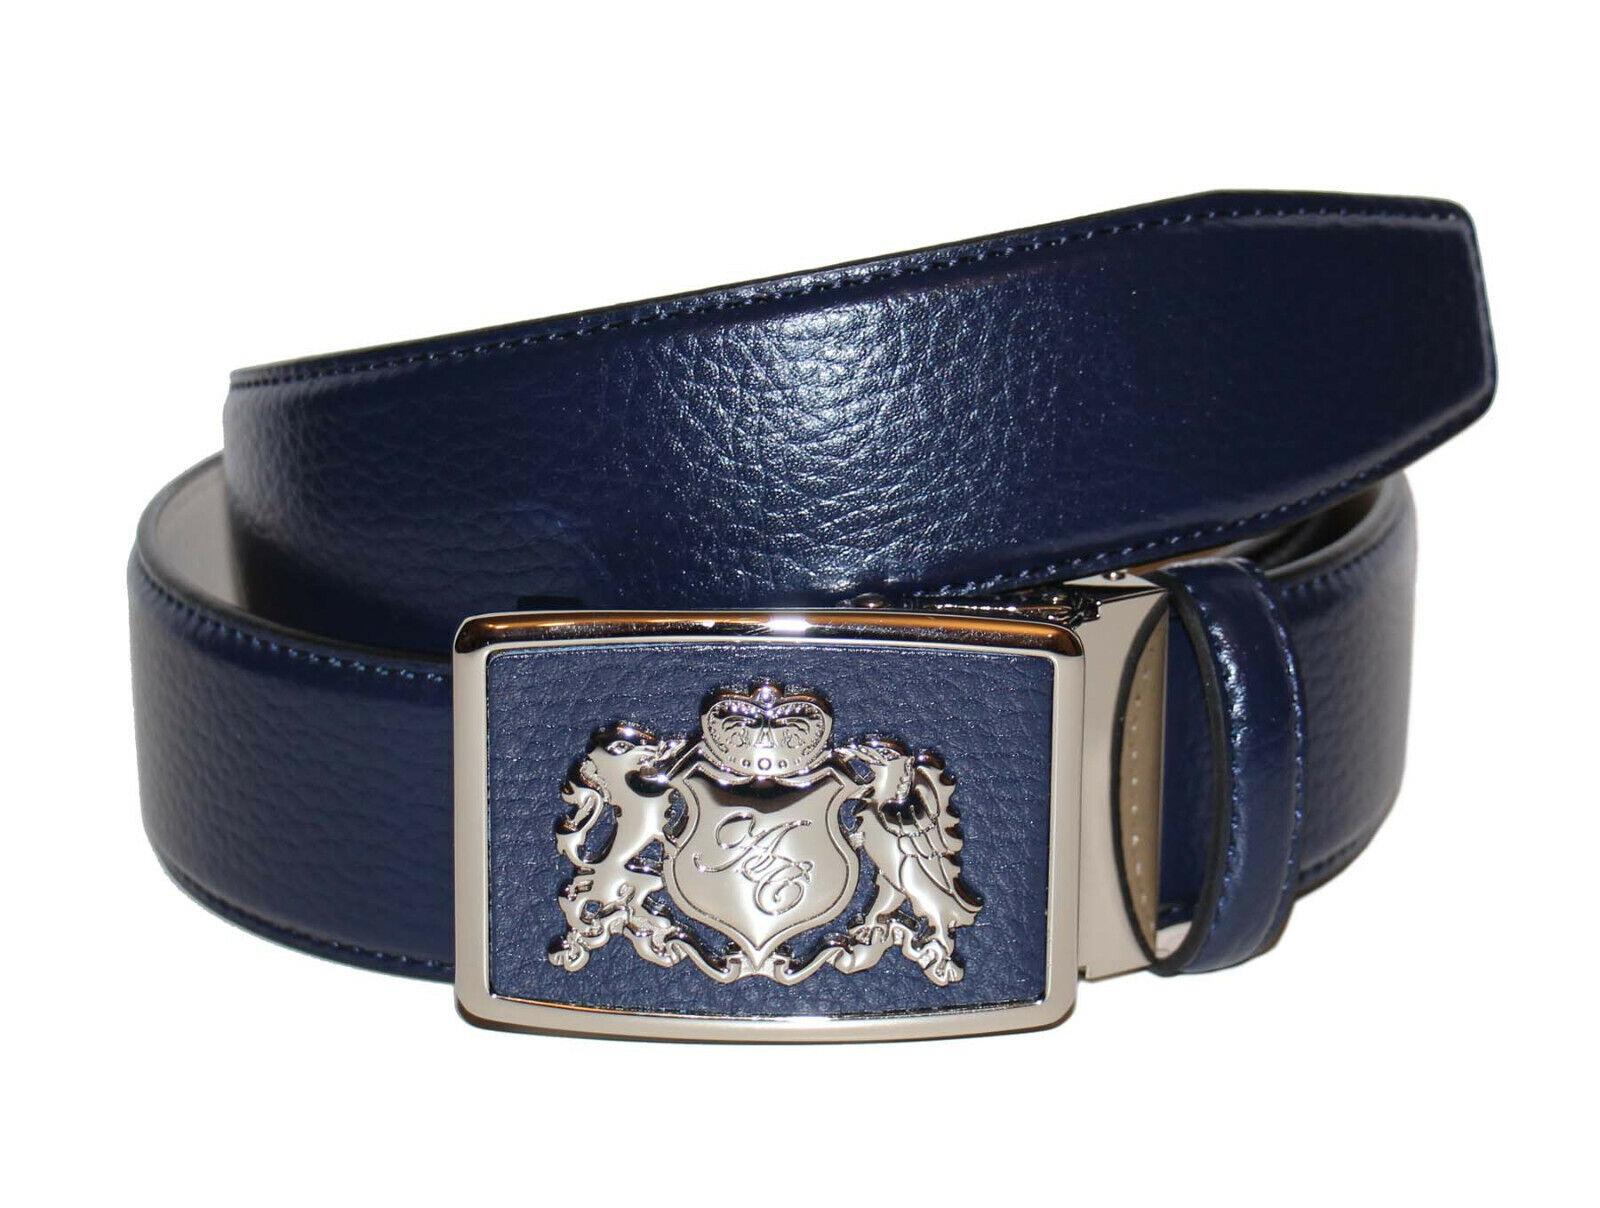 Anthoni Crown Belt Herren Gürtel Ledergürtel Größe 85